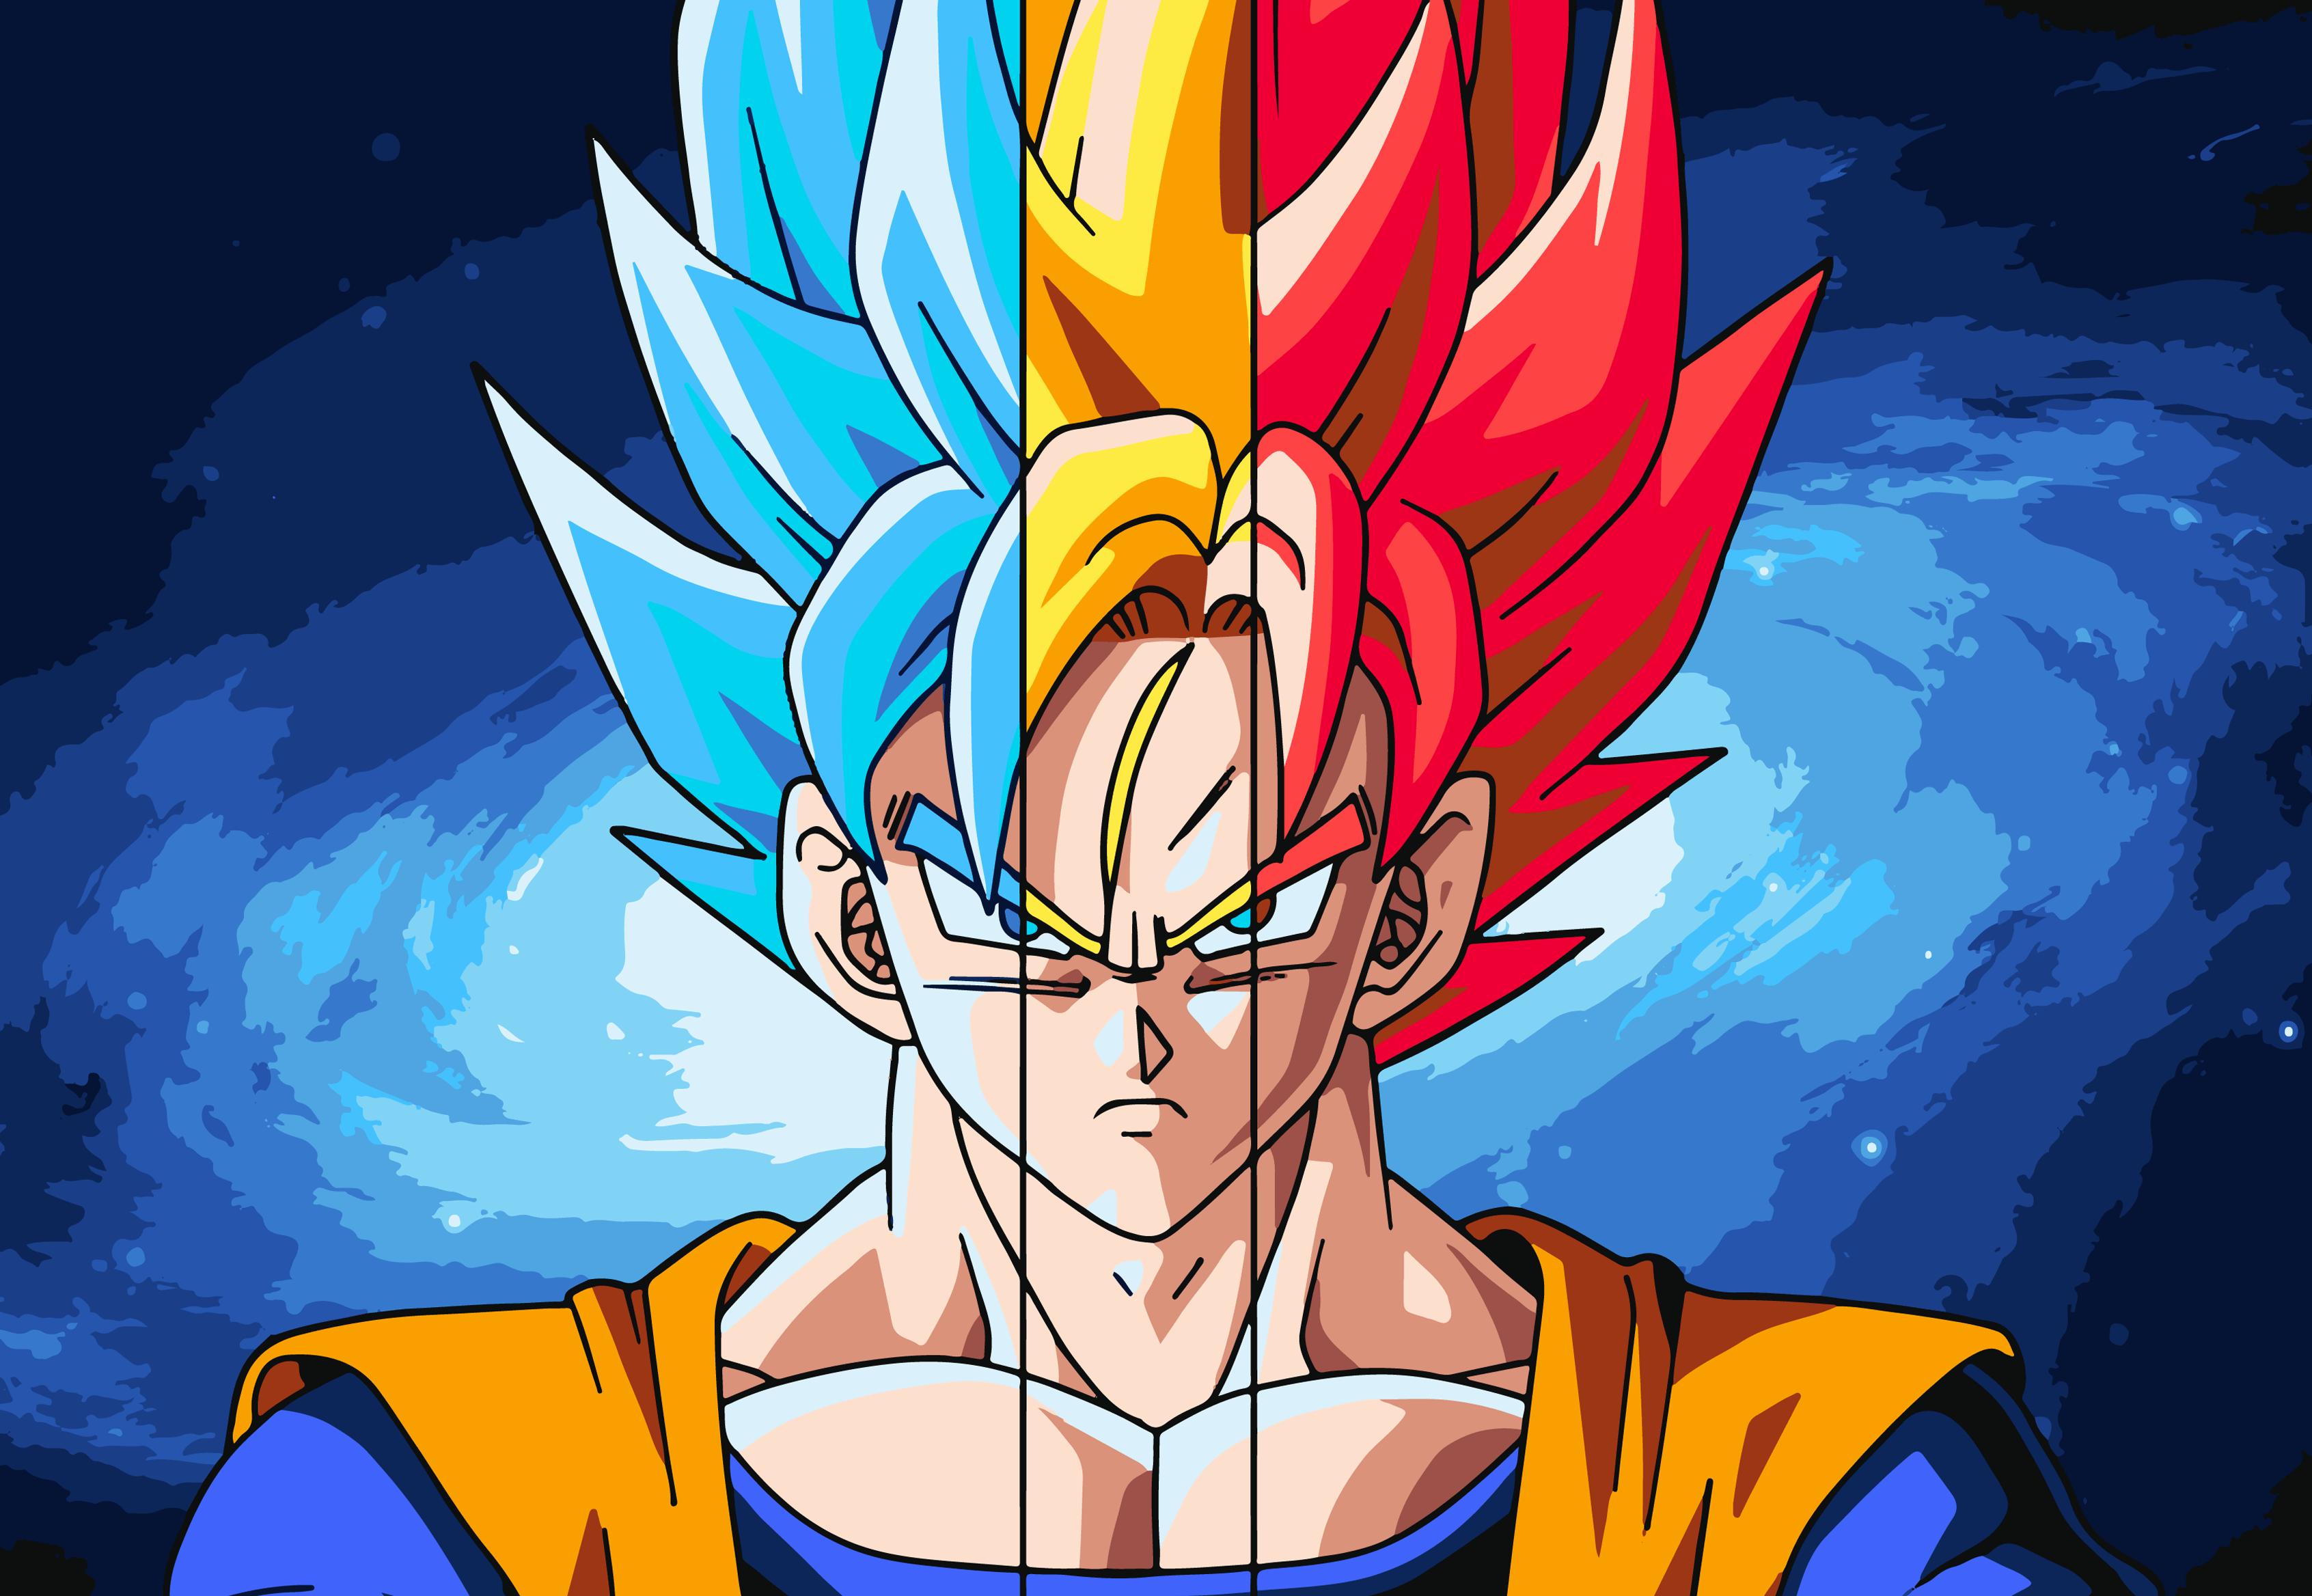 Goku Super Saiyan Wallpapers Top Free Goku Super Saiyan